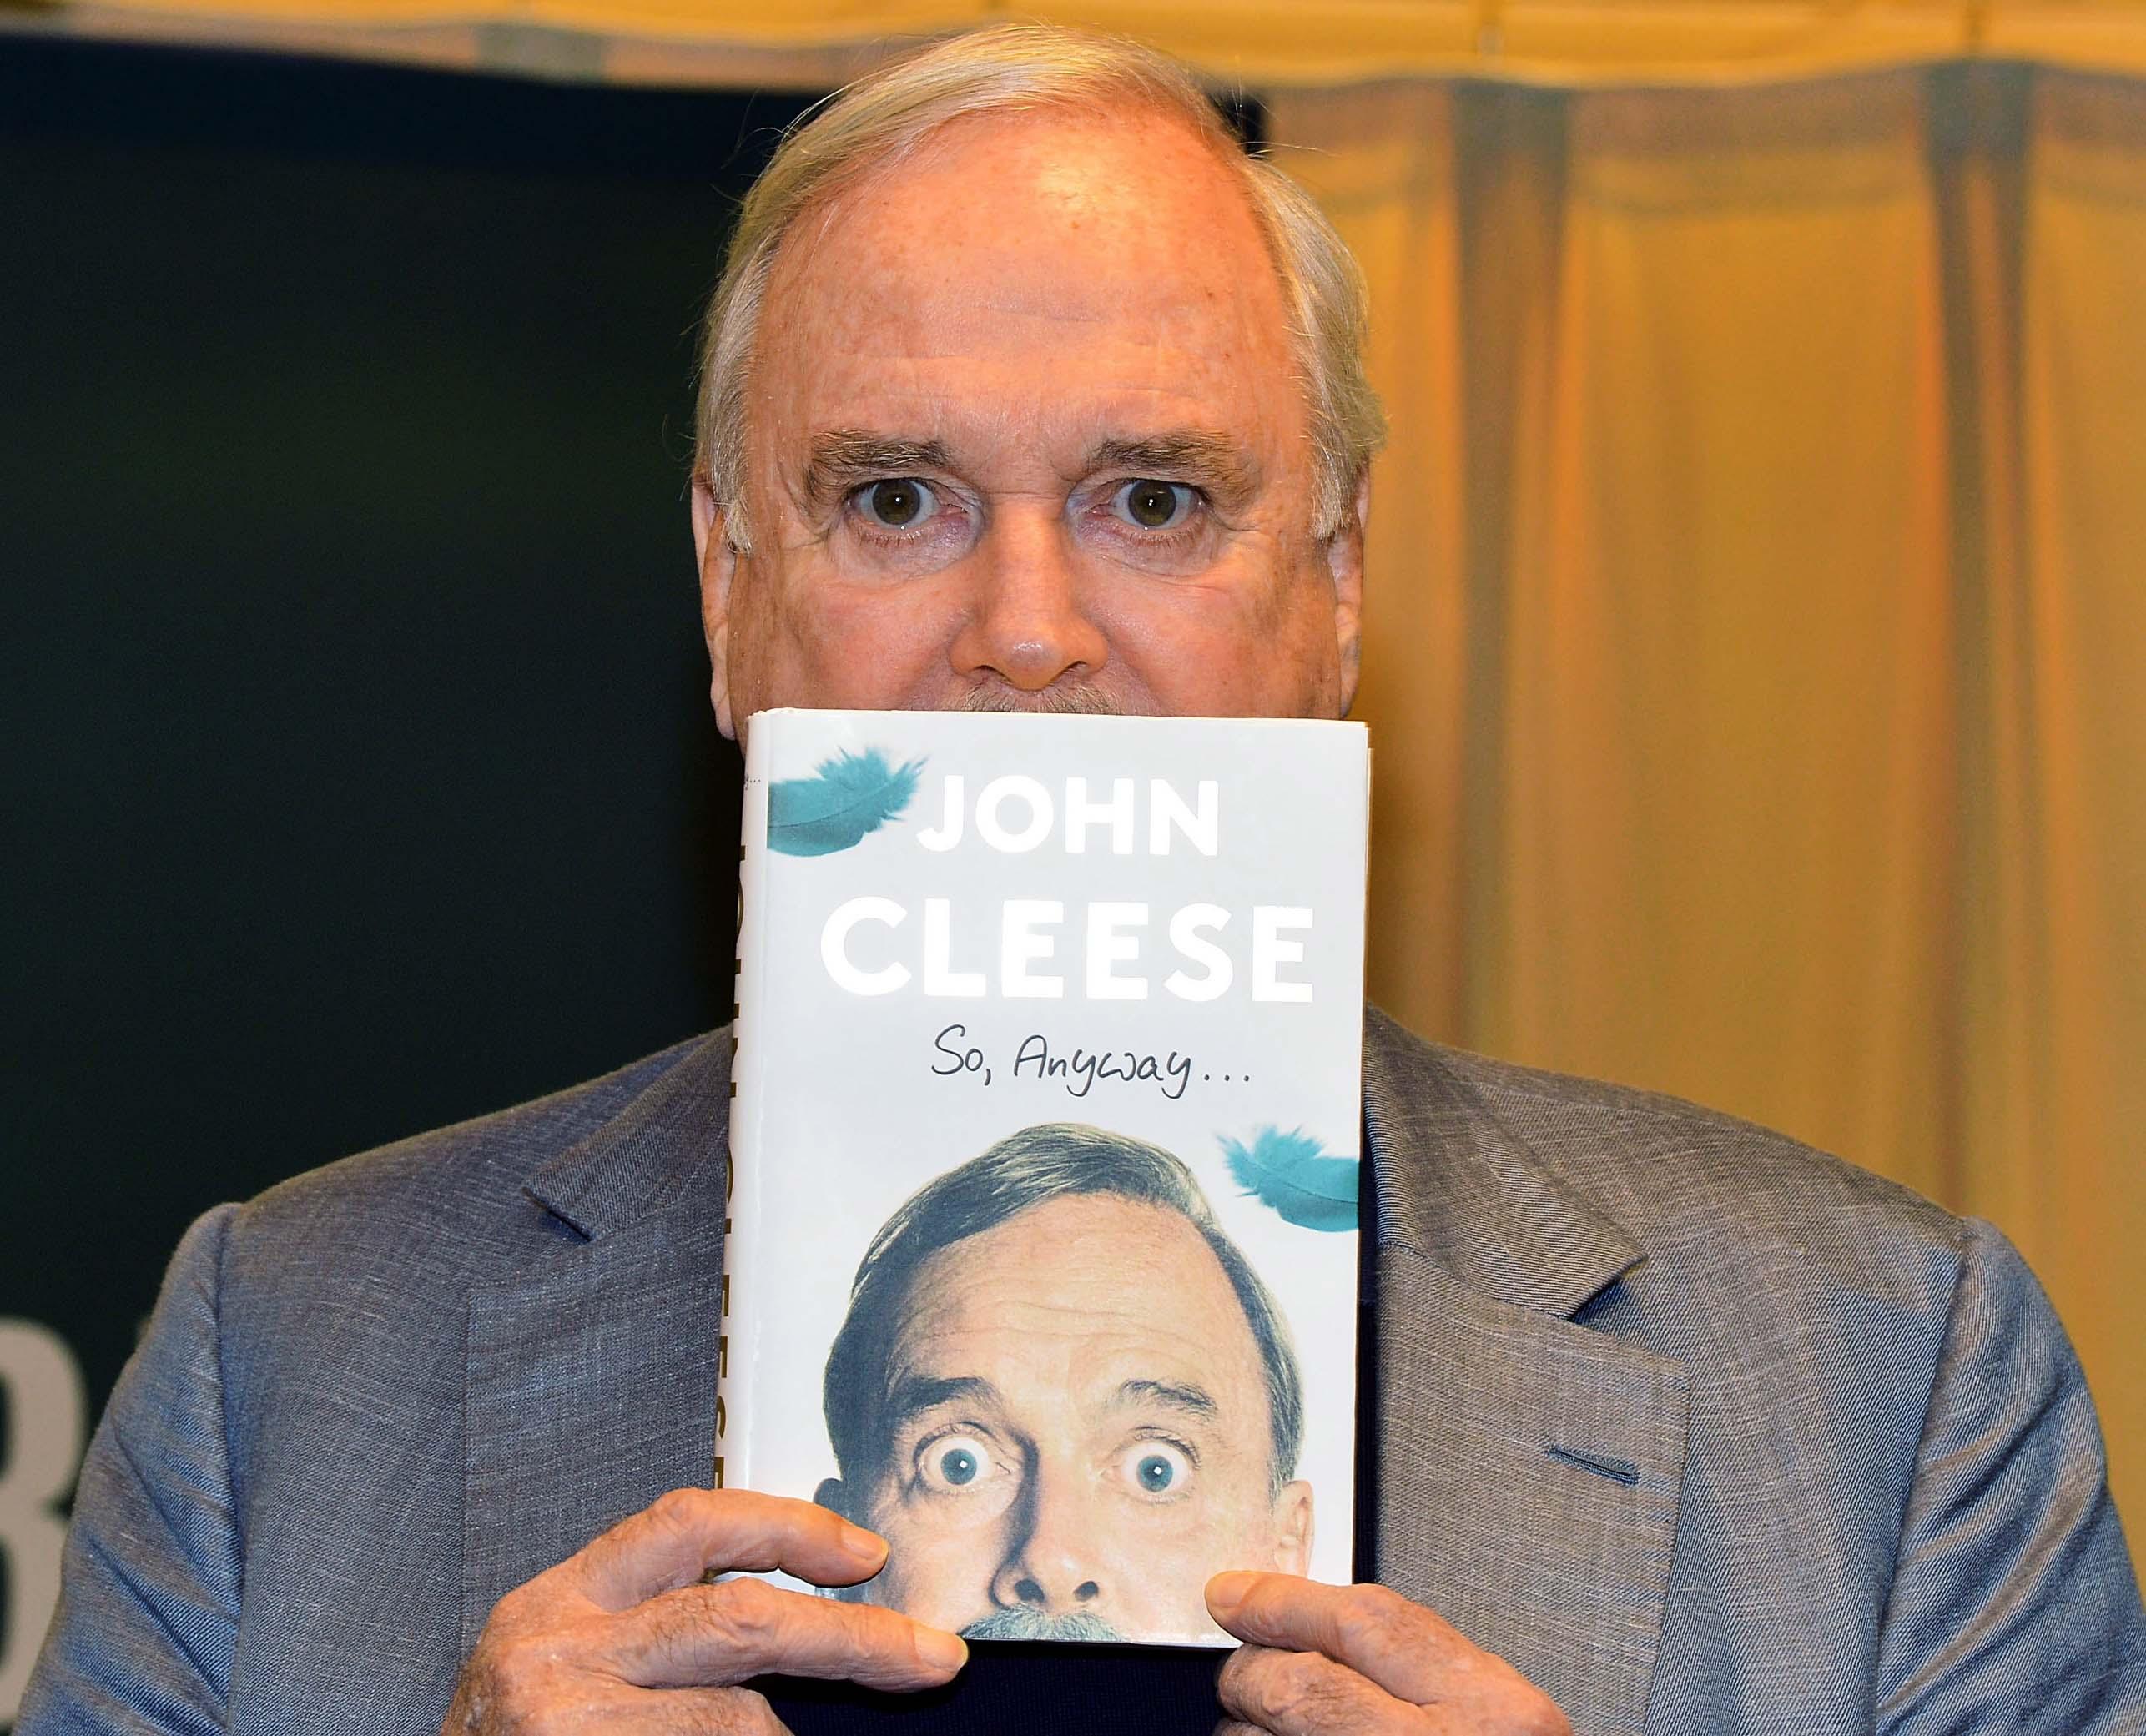 john-cleese-so-anyway-livro